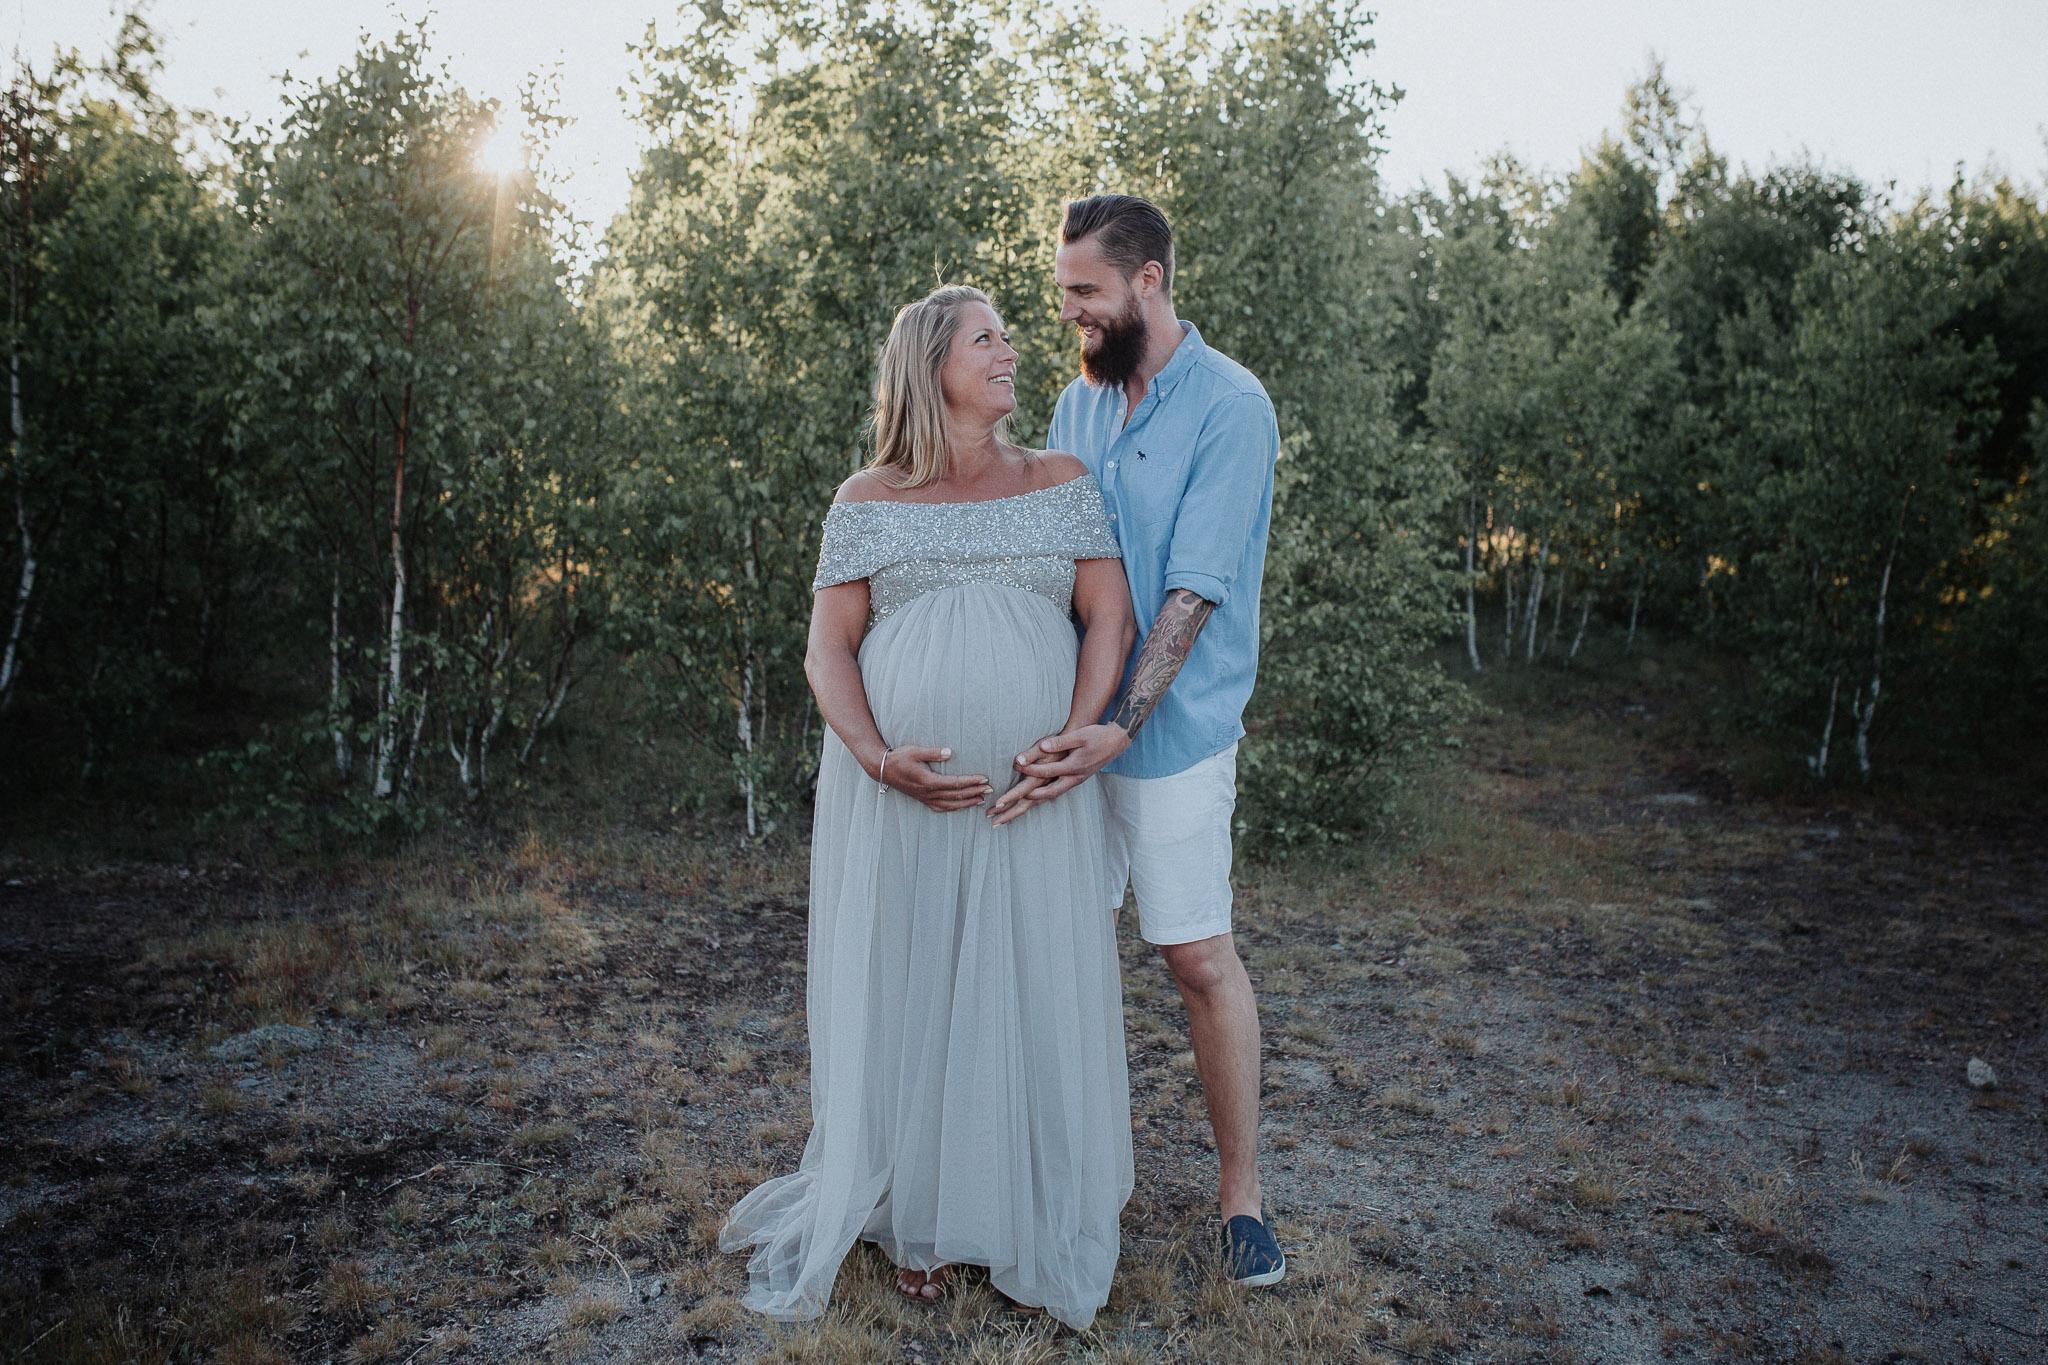 Gravidfotografering Torkö stenbrott Ronneby Annatarfoto